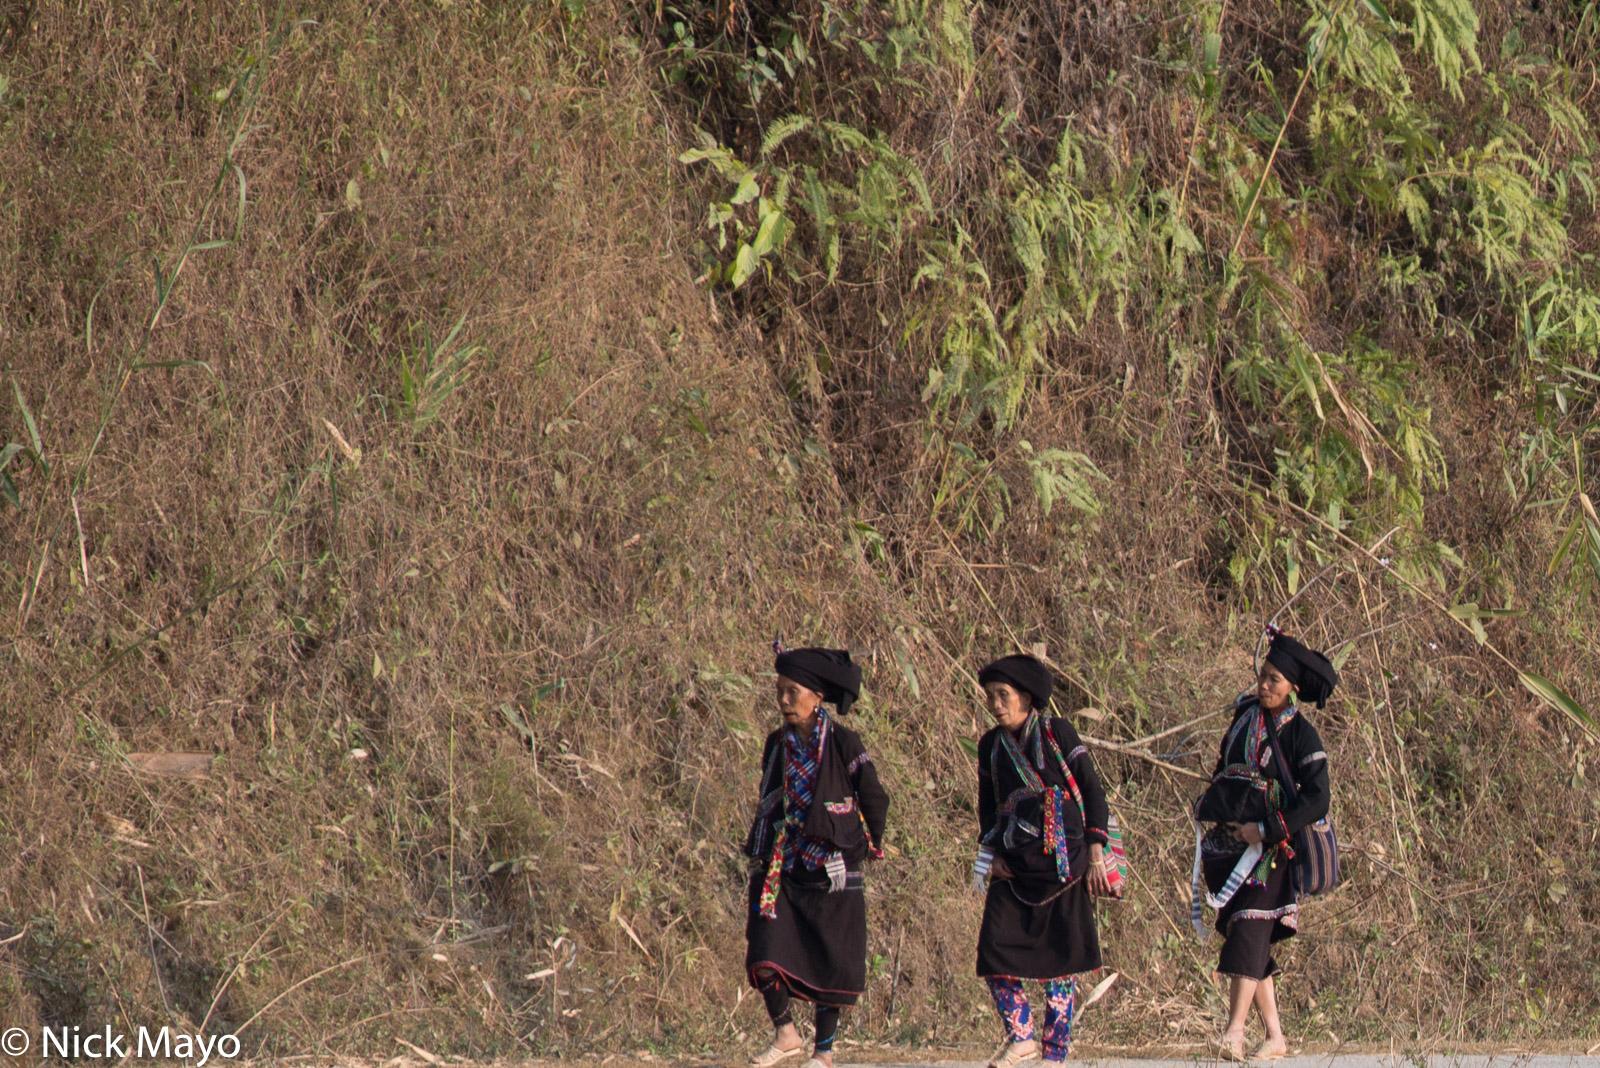 Three Lao women making a New Year visit at Nha Lung.